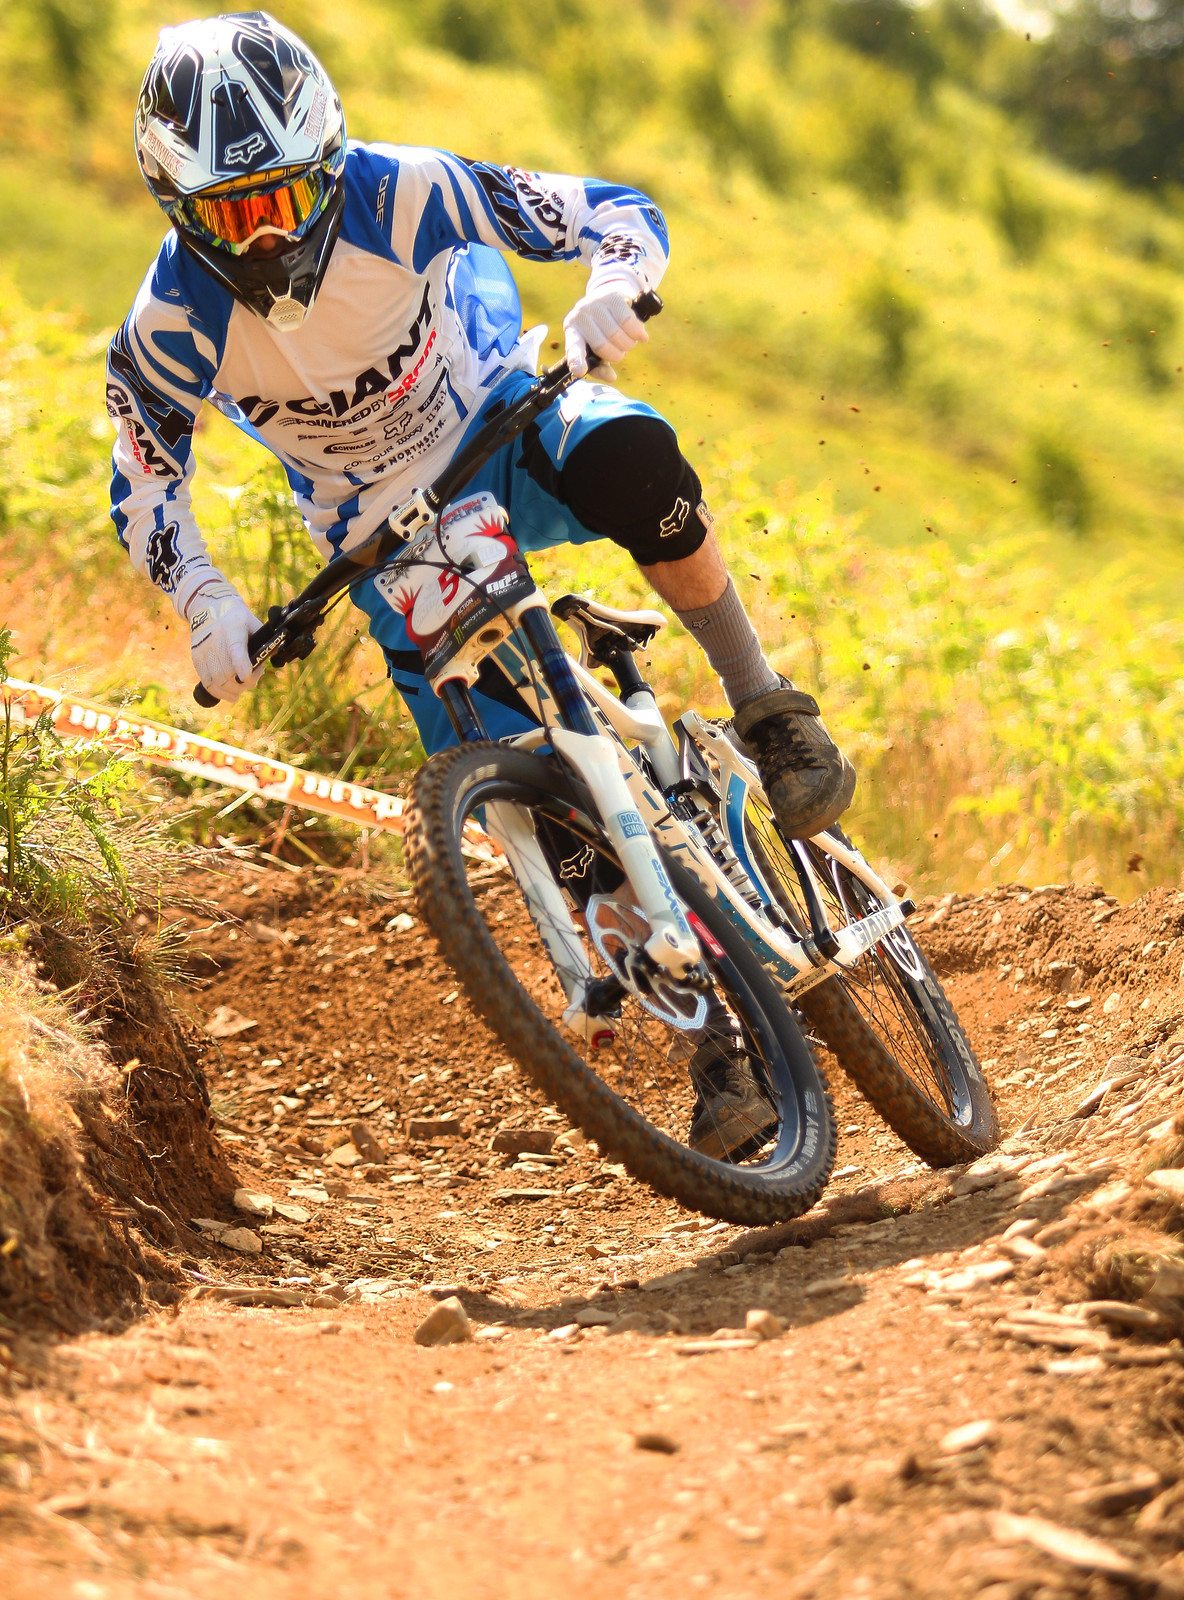 Danny Hart - Llangollen - SamDavies - Mountain Biking Pictures - Vital MTB